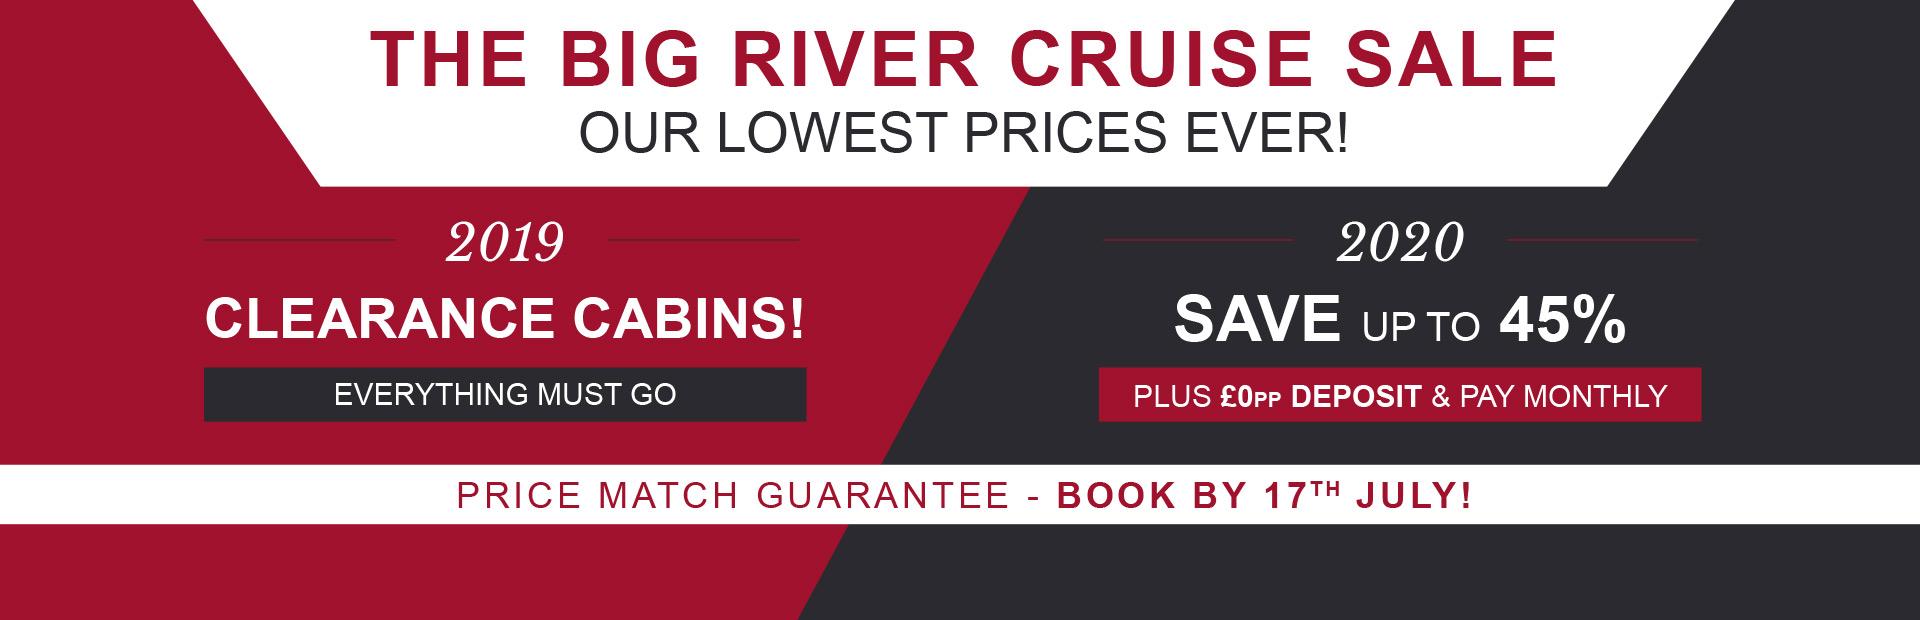 Big River Cruise Sale